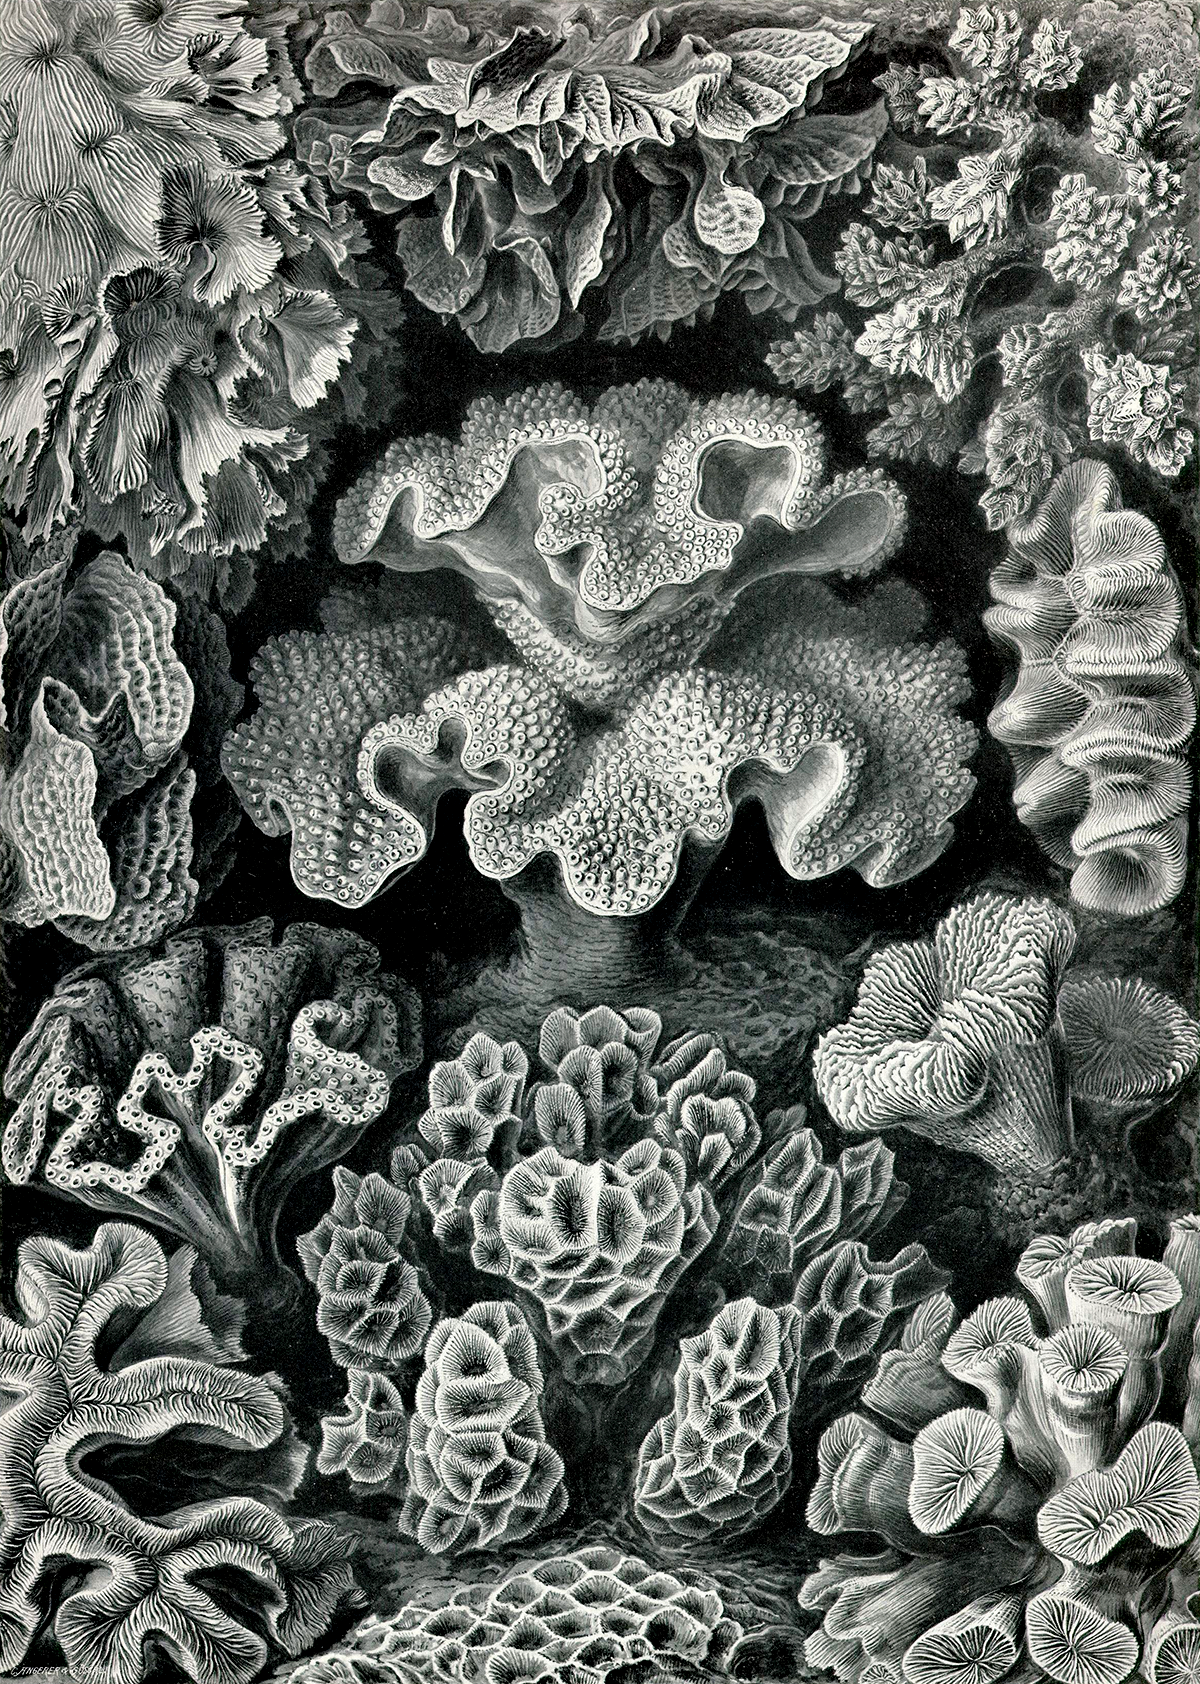 Art Forms in Nature di Ernst Haeckel